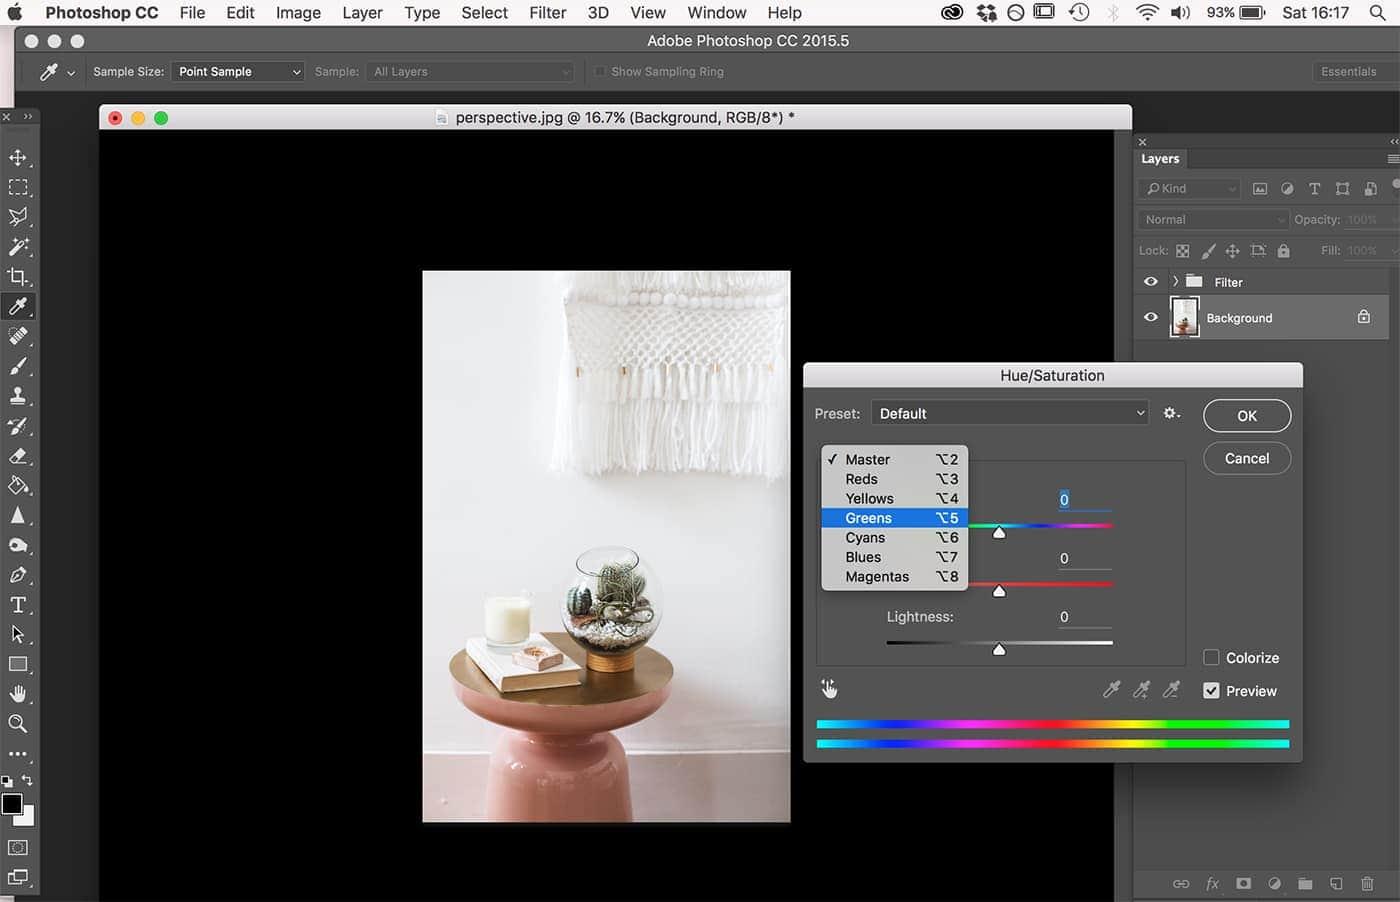 hue-saturation-panel